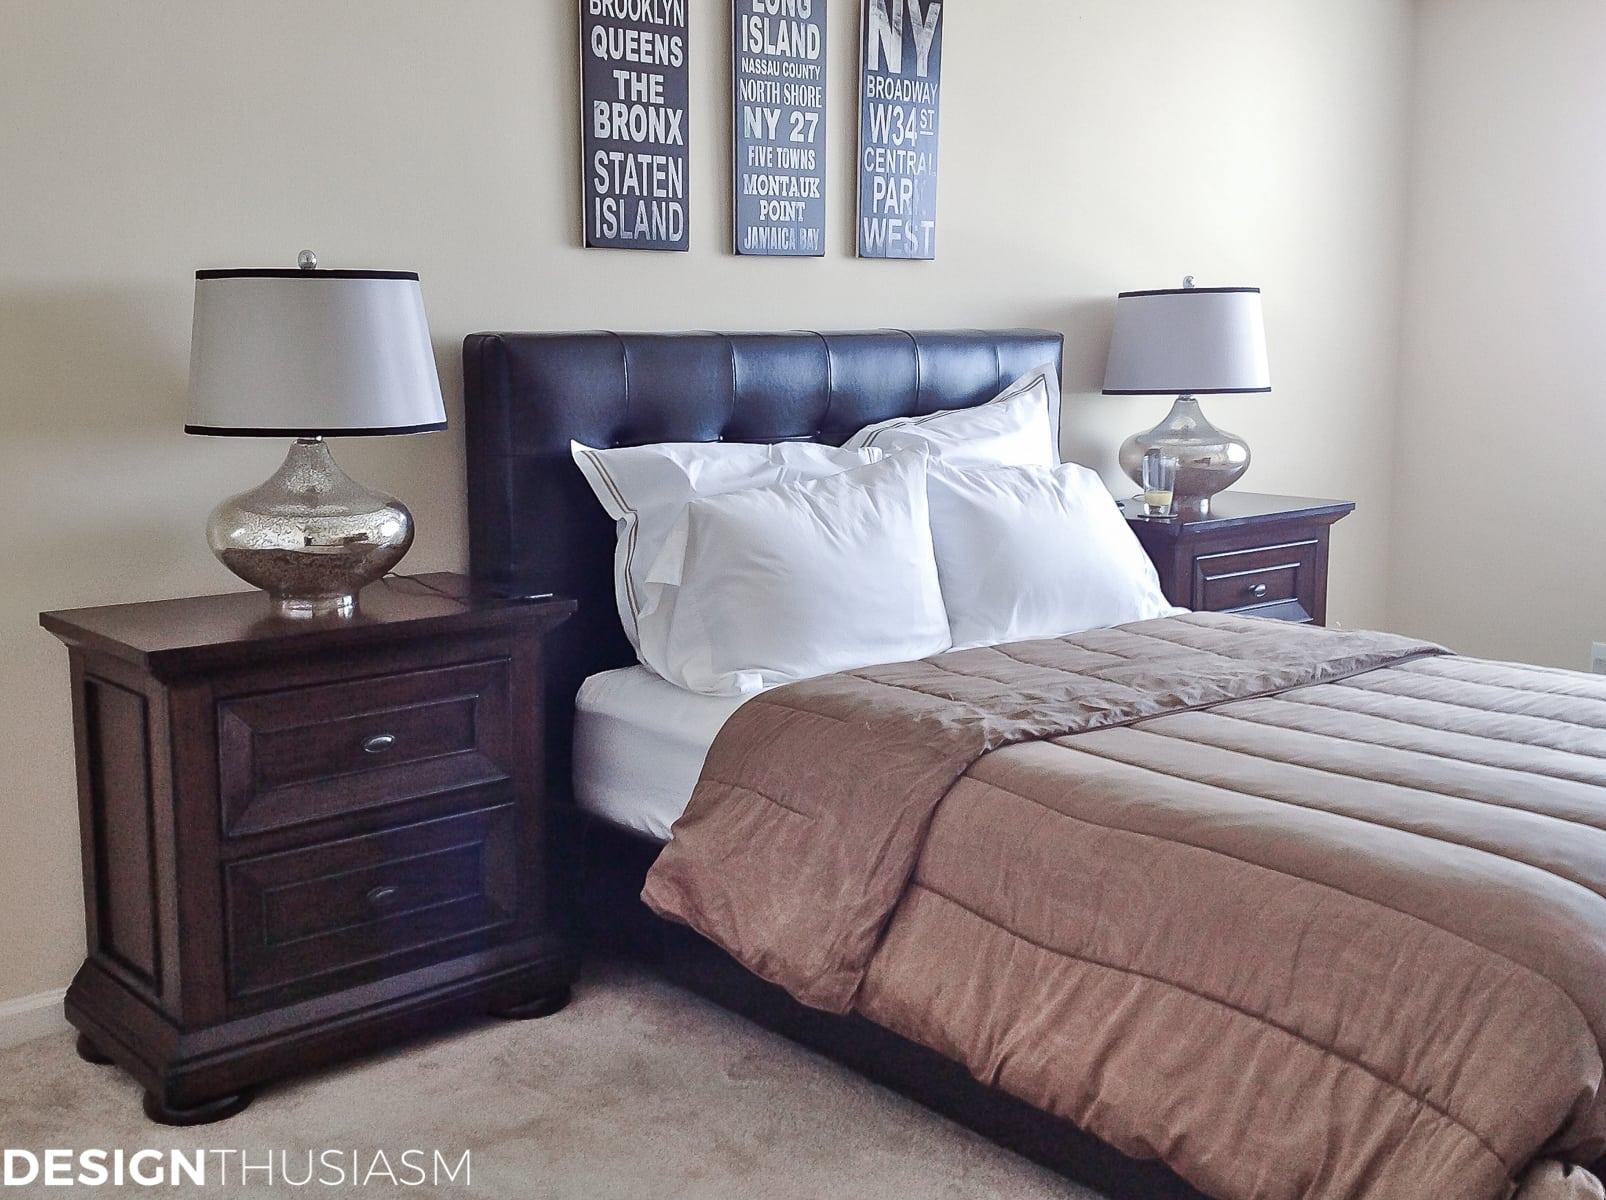 Bachelor Pad Decor Part 3: Classic Mens Bedroom Ideas on Guys Small Bedroom Ideas  id=56735